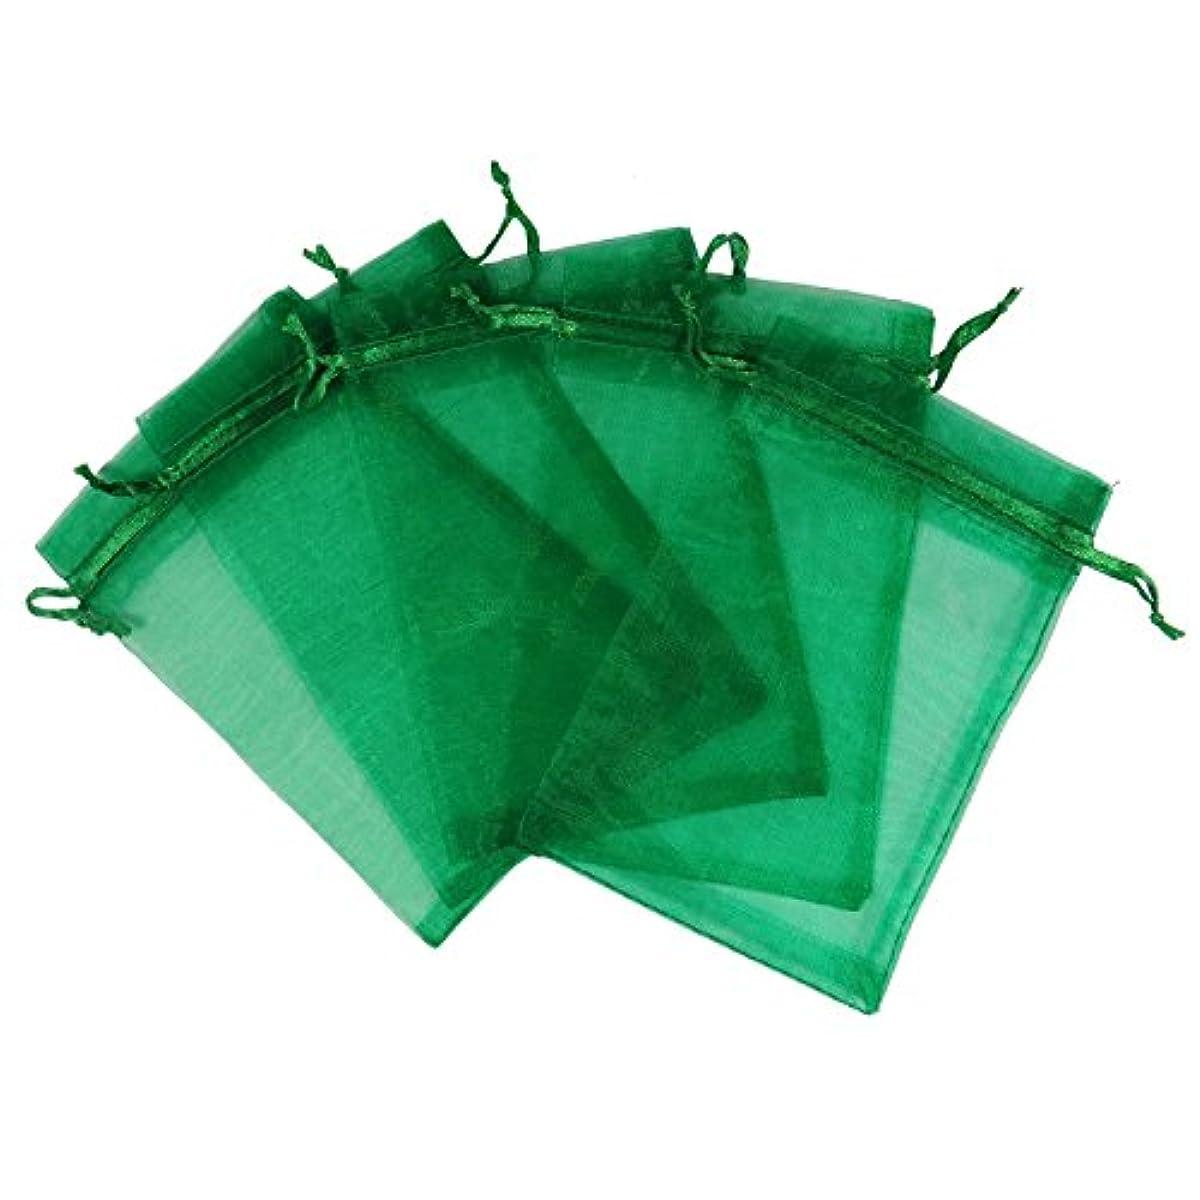 RakrisaSupplies 100Pcs Deep Green Organza Bags 3x4